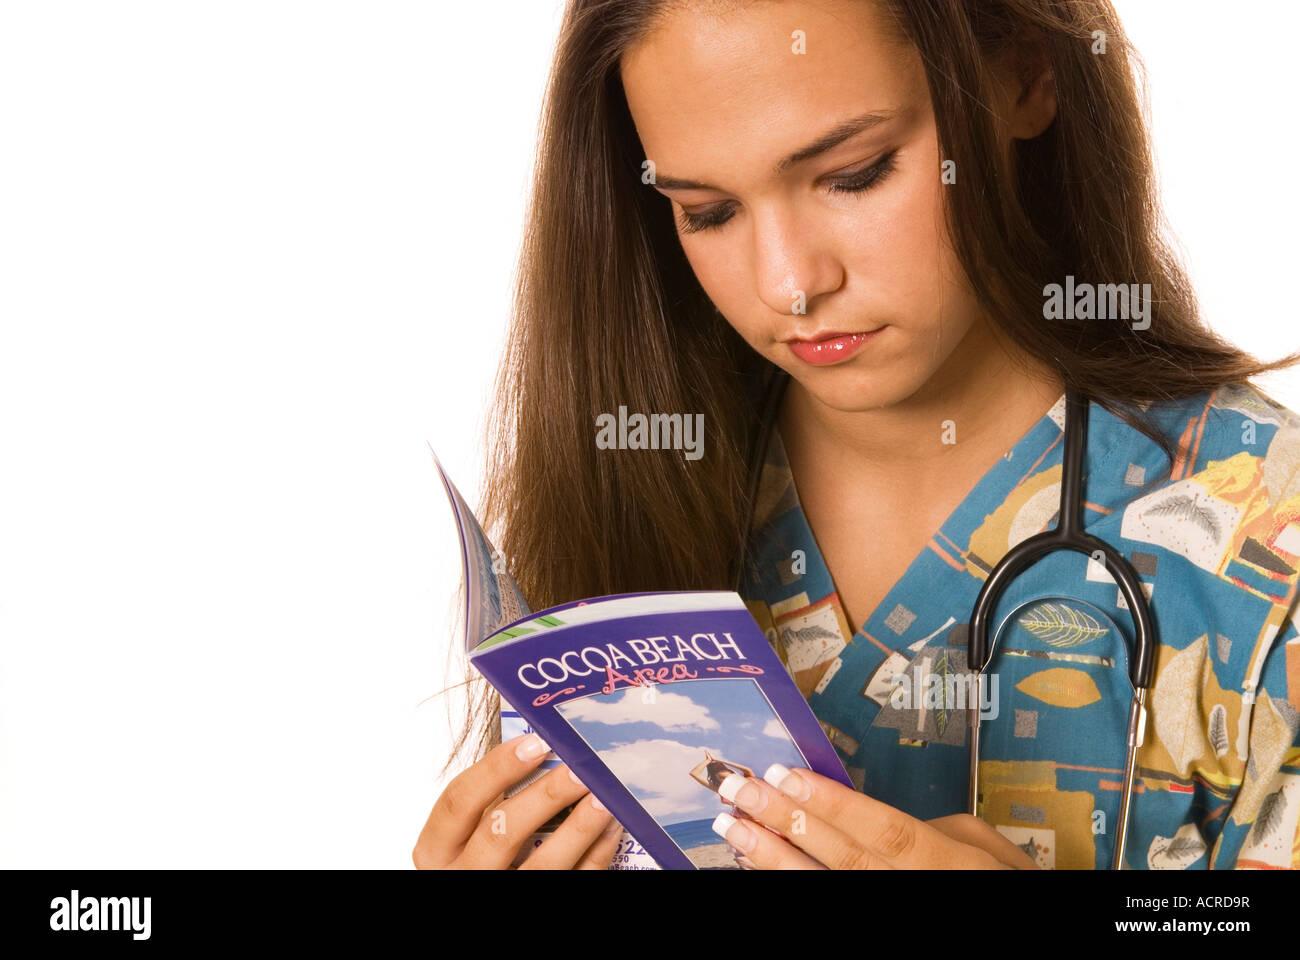 Female Nurse (20-25) Looking at Florida Travel Brochure - Stock Image